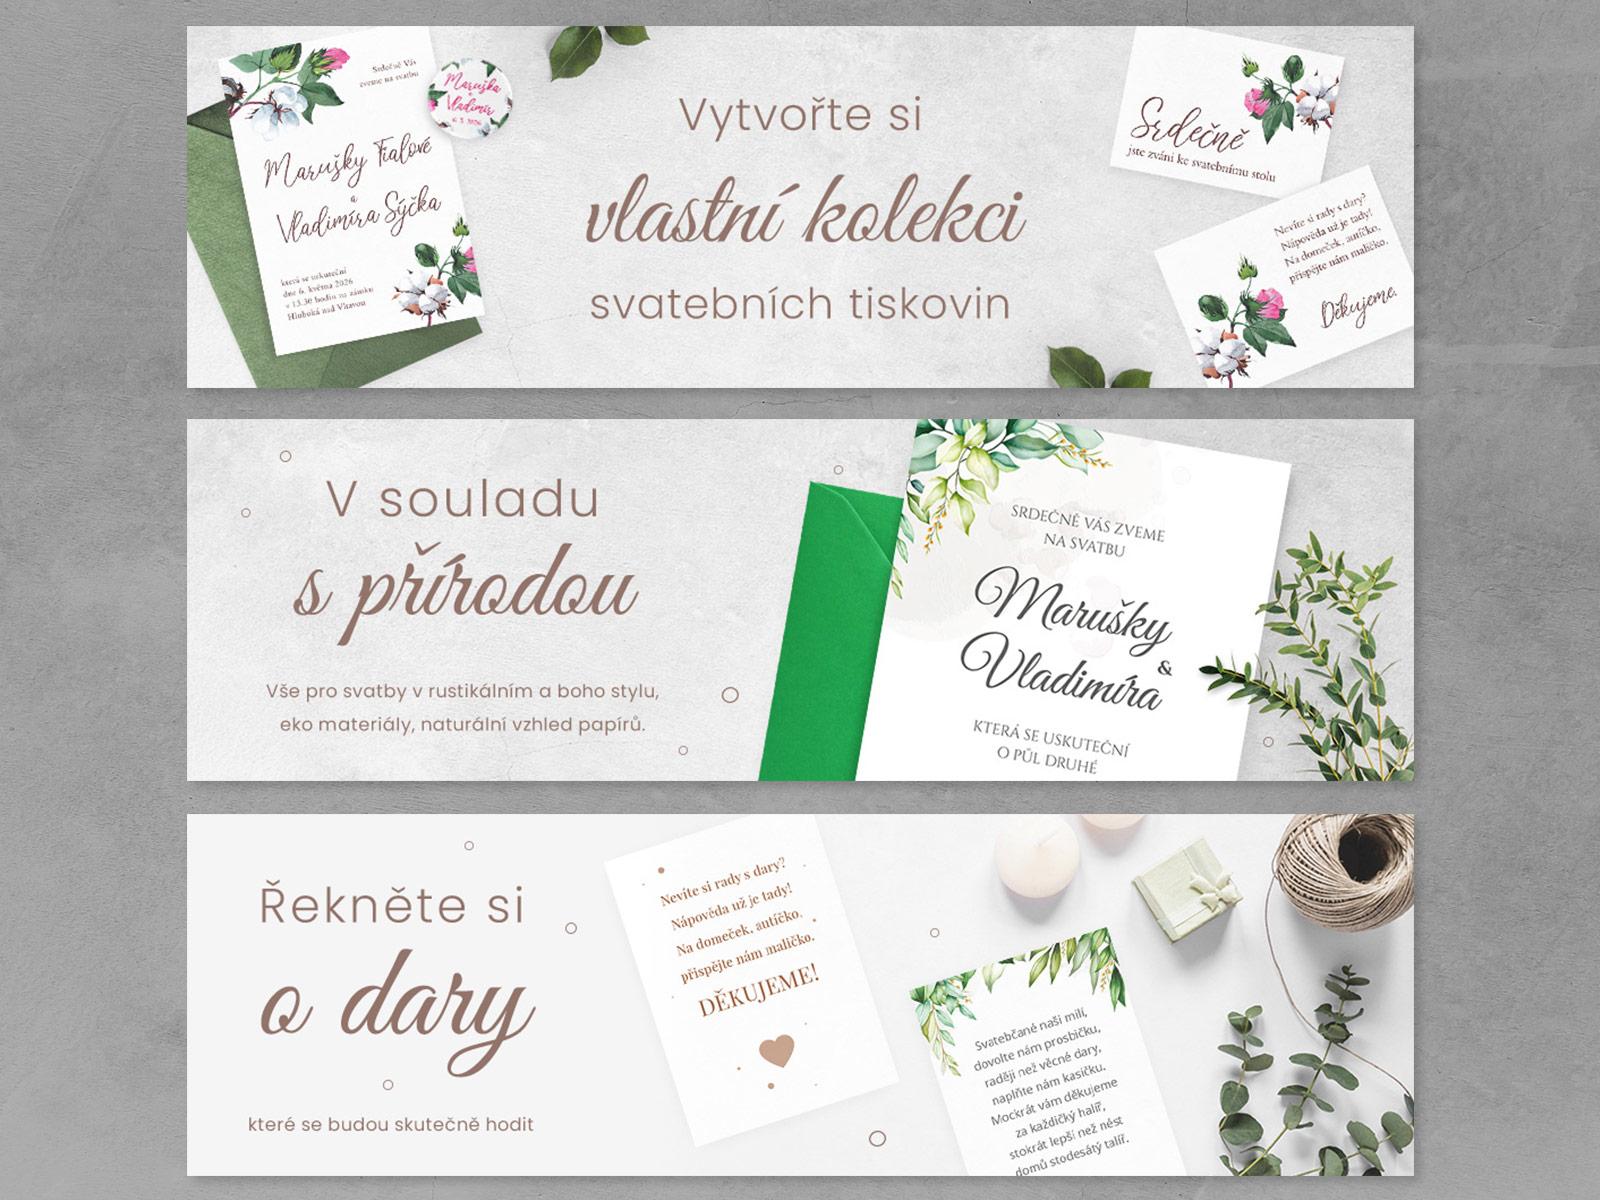 WhiteDesigns.cz - Tvorba bannerů pro e-shopy